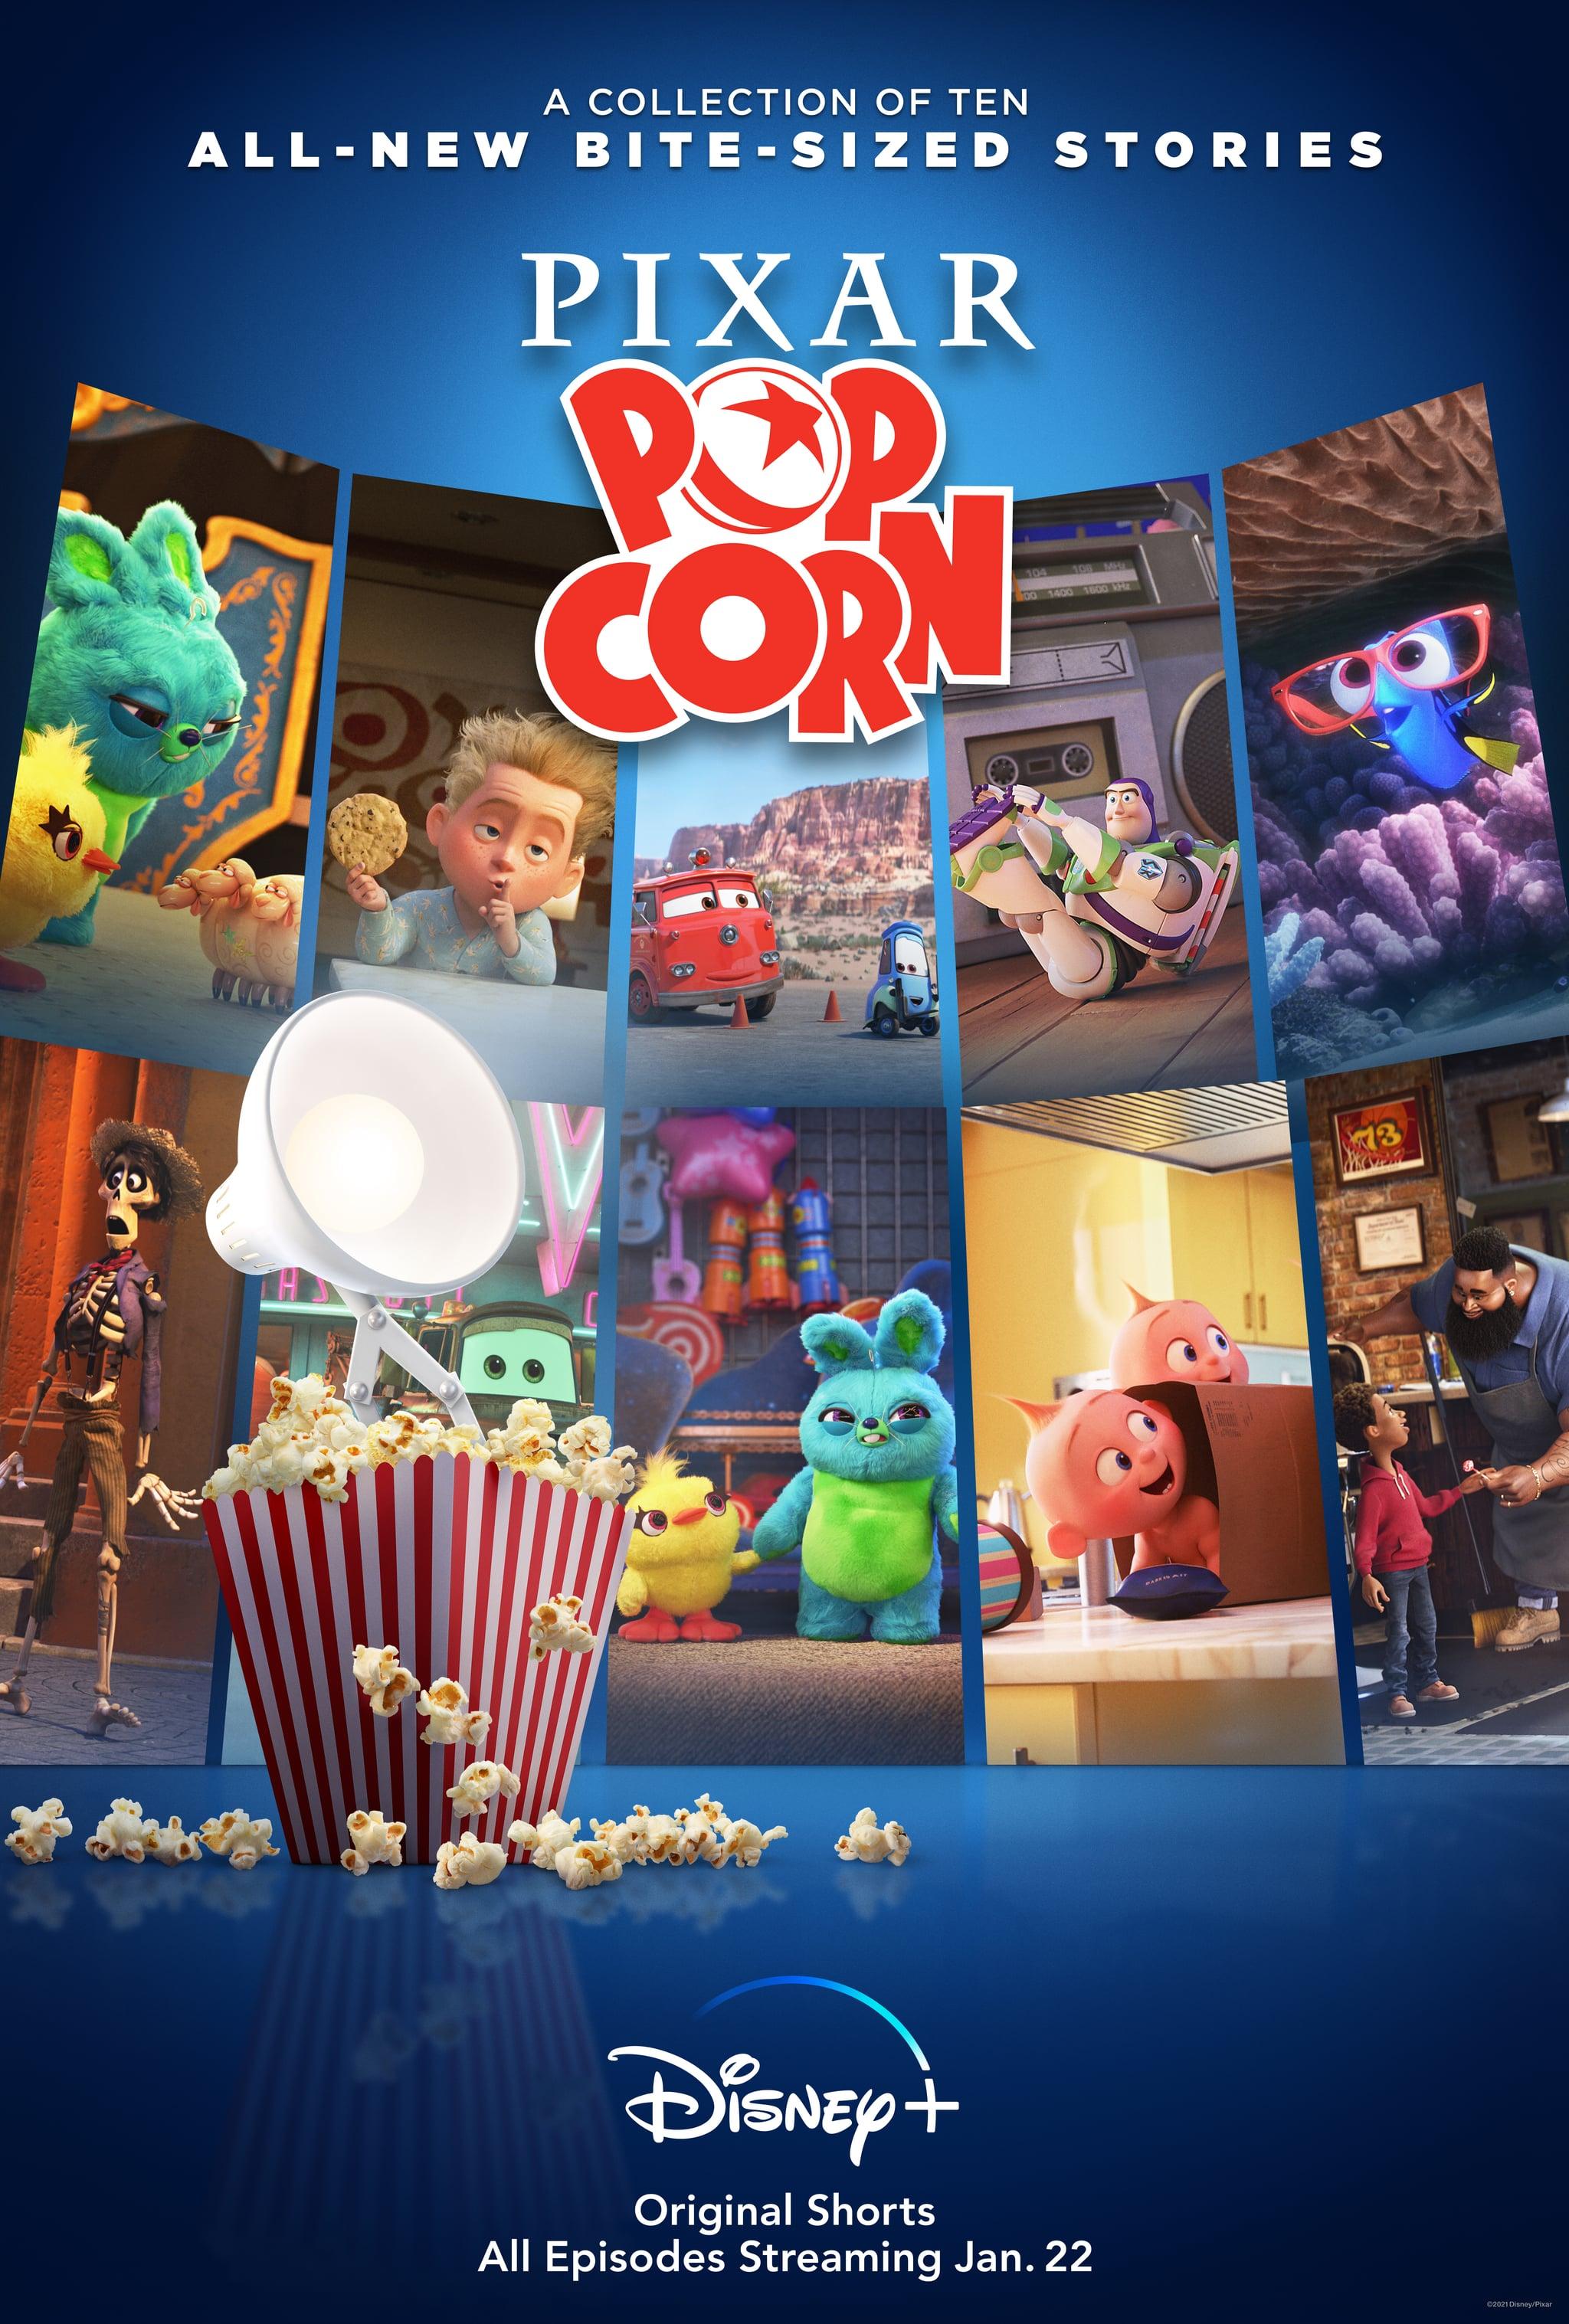 Disney Plus's Pixar Popcorn Series